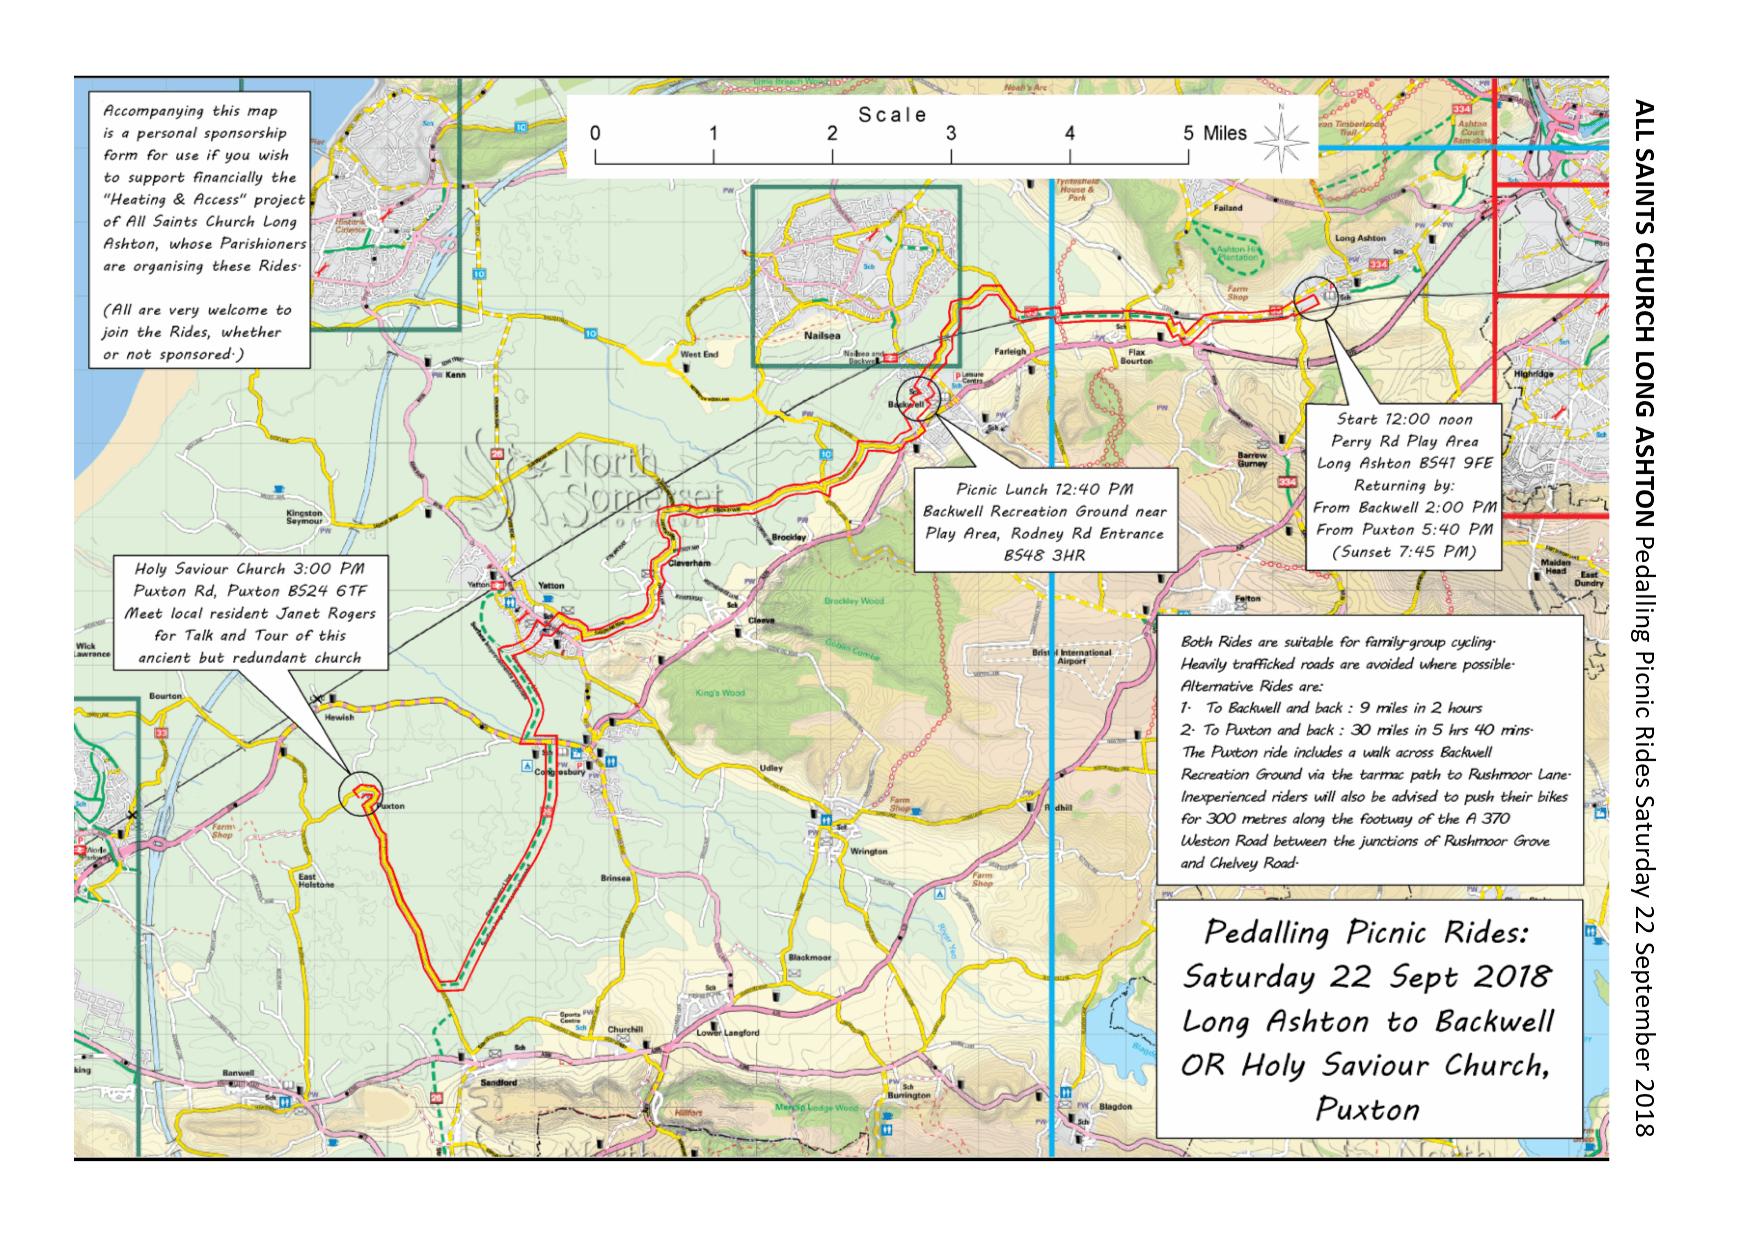 Puxton Park ride map - Saturday 22 September 2018